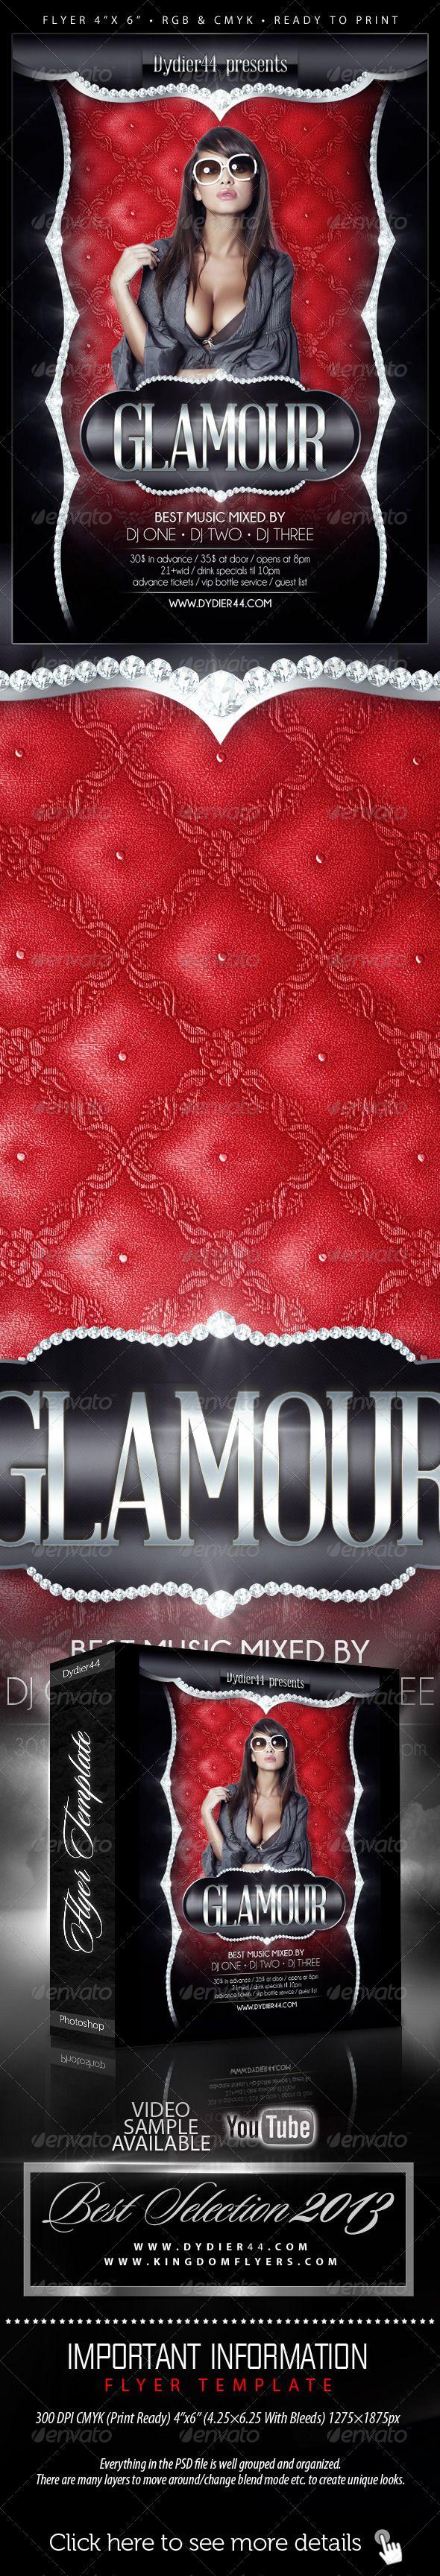 14 best invitation images on pinterest invitations burgundy rugs